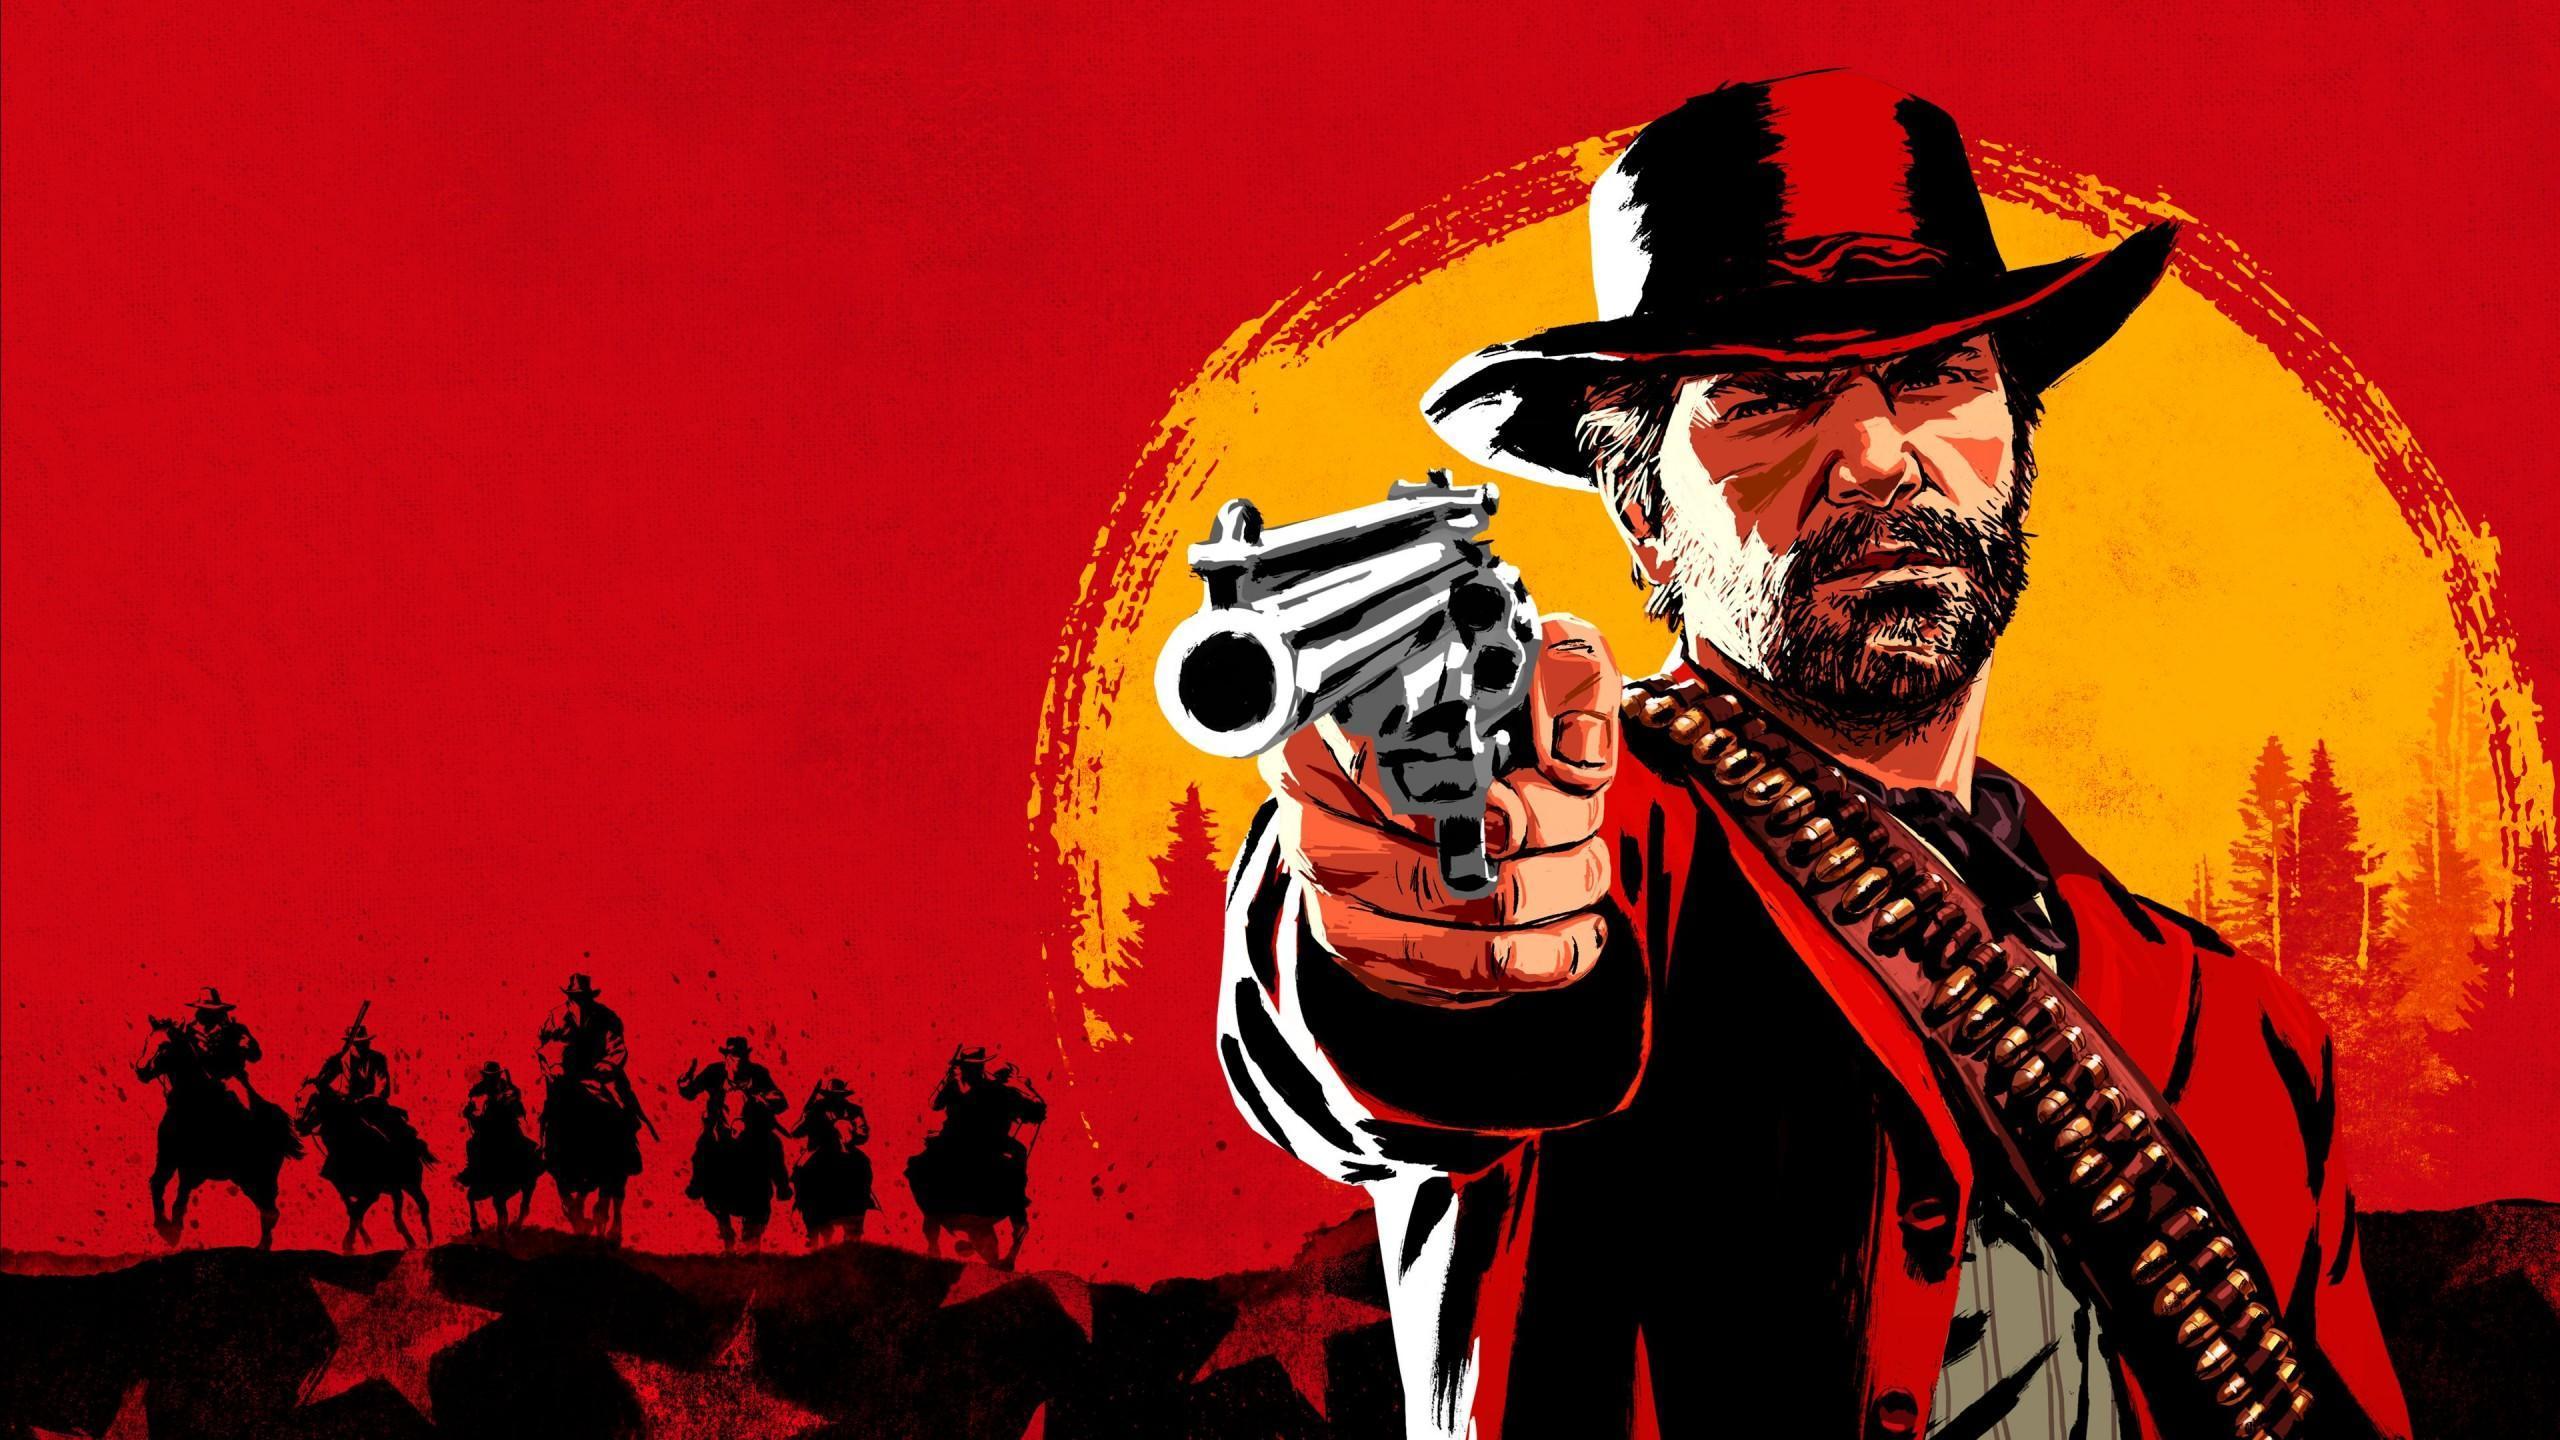 Exclusive: Red Dead Redemption 2 Plot Details Revealed